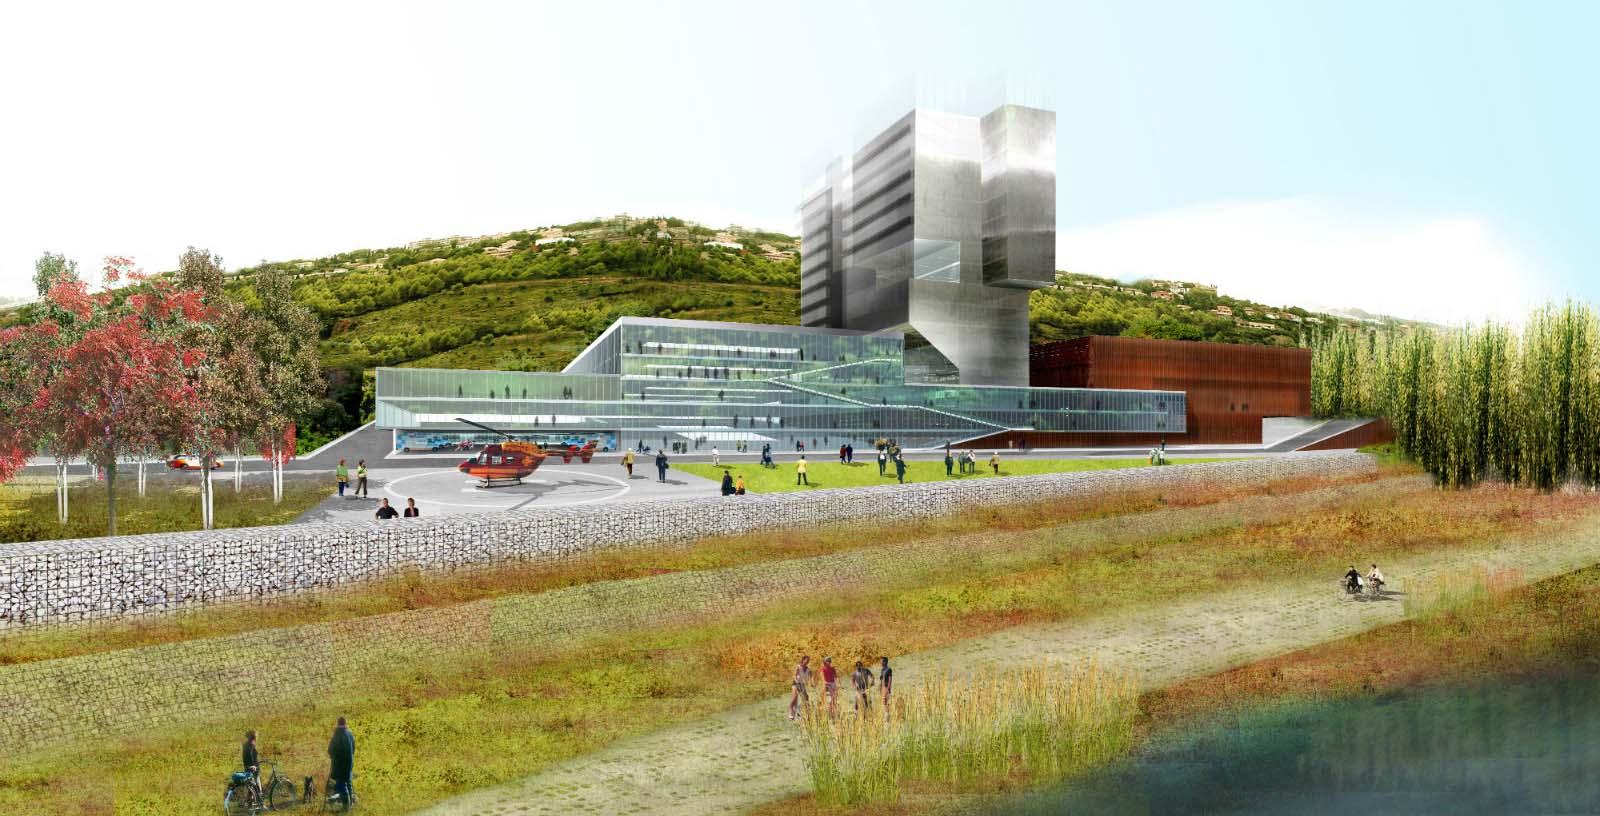 DR._JOSEP_TRUETA_HOSPITAL_03_Architecture_IDOM_Copyright